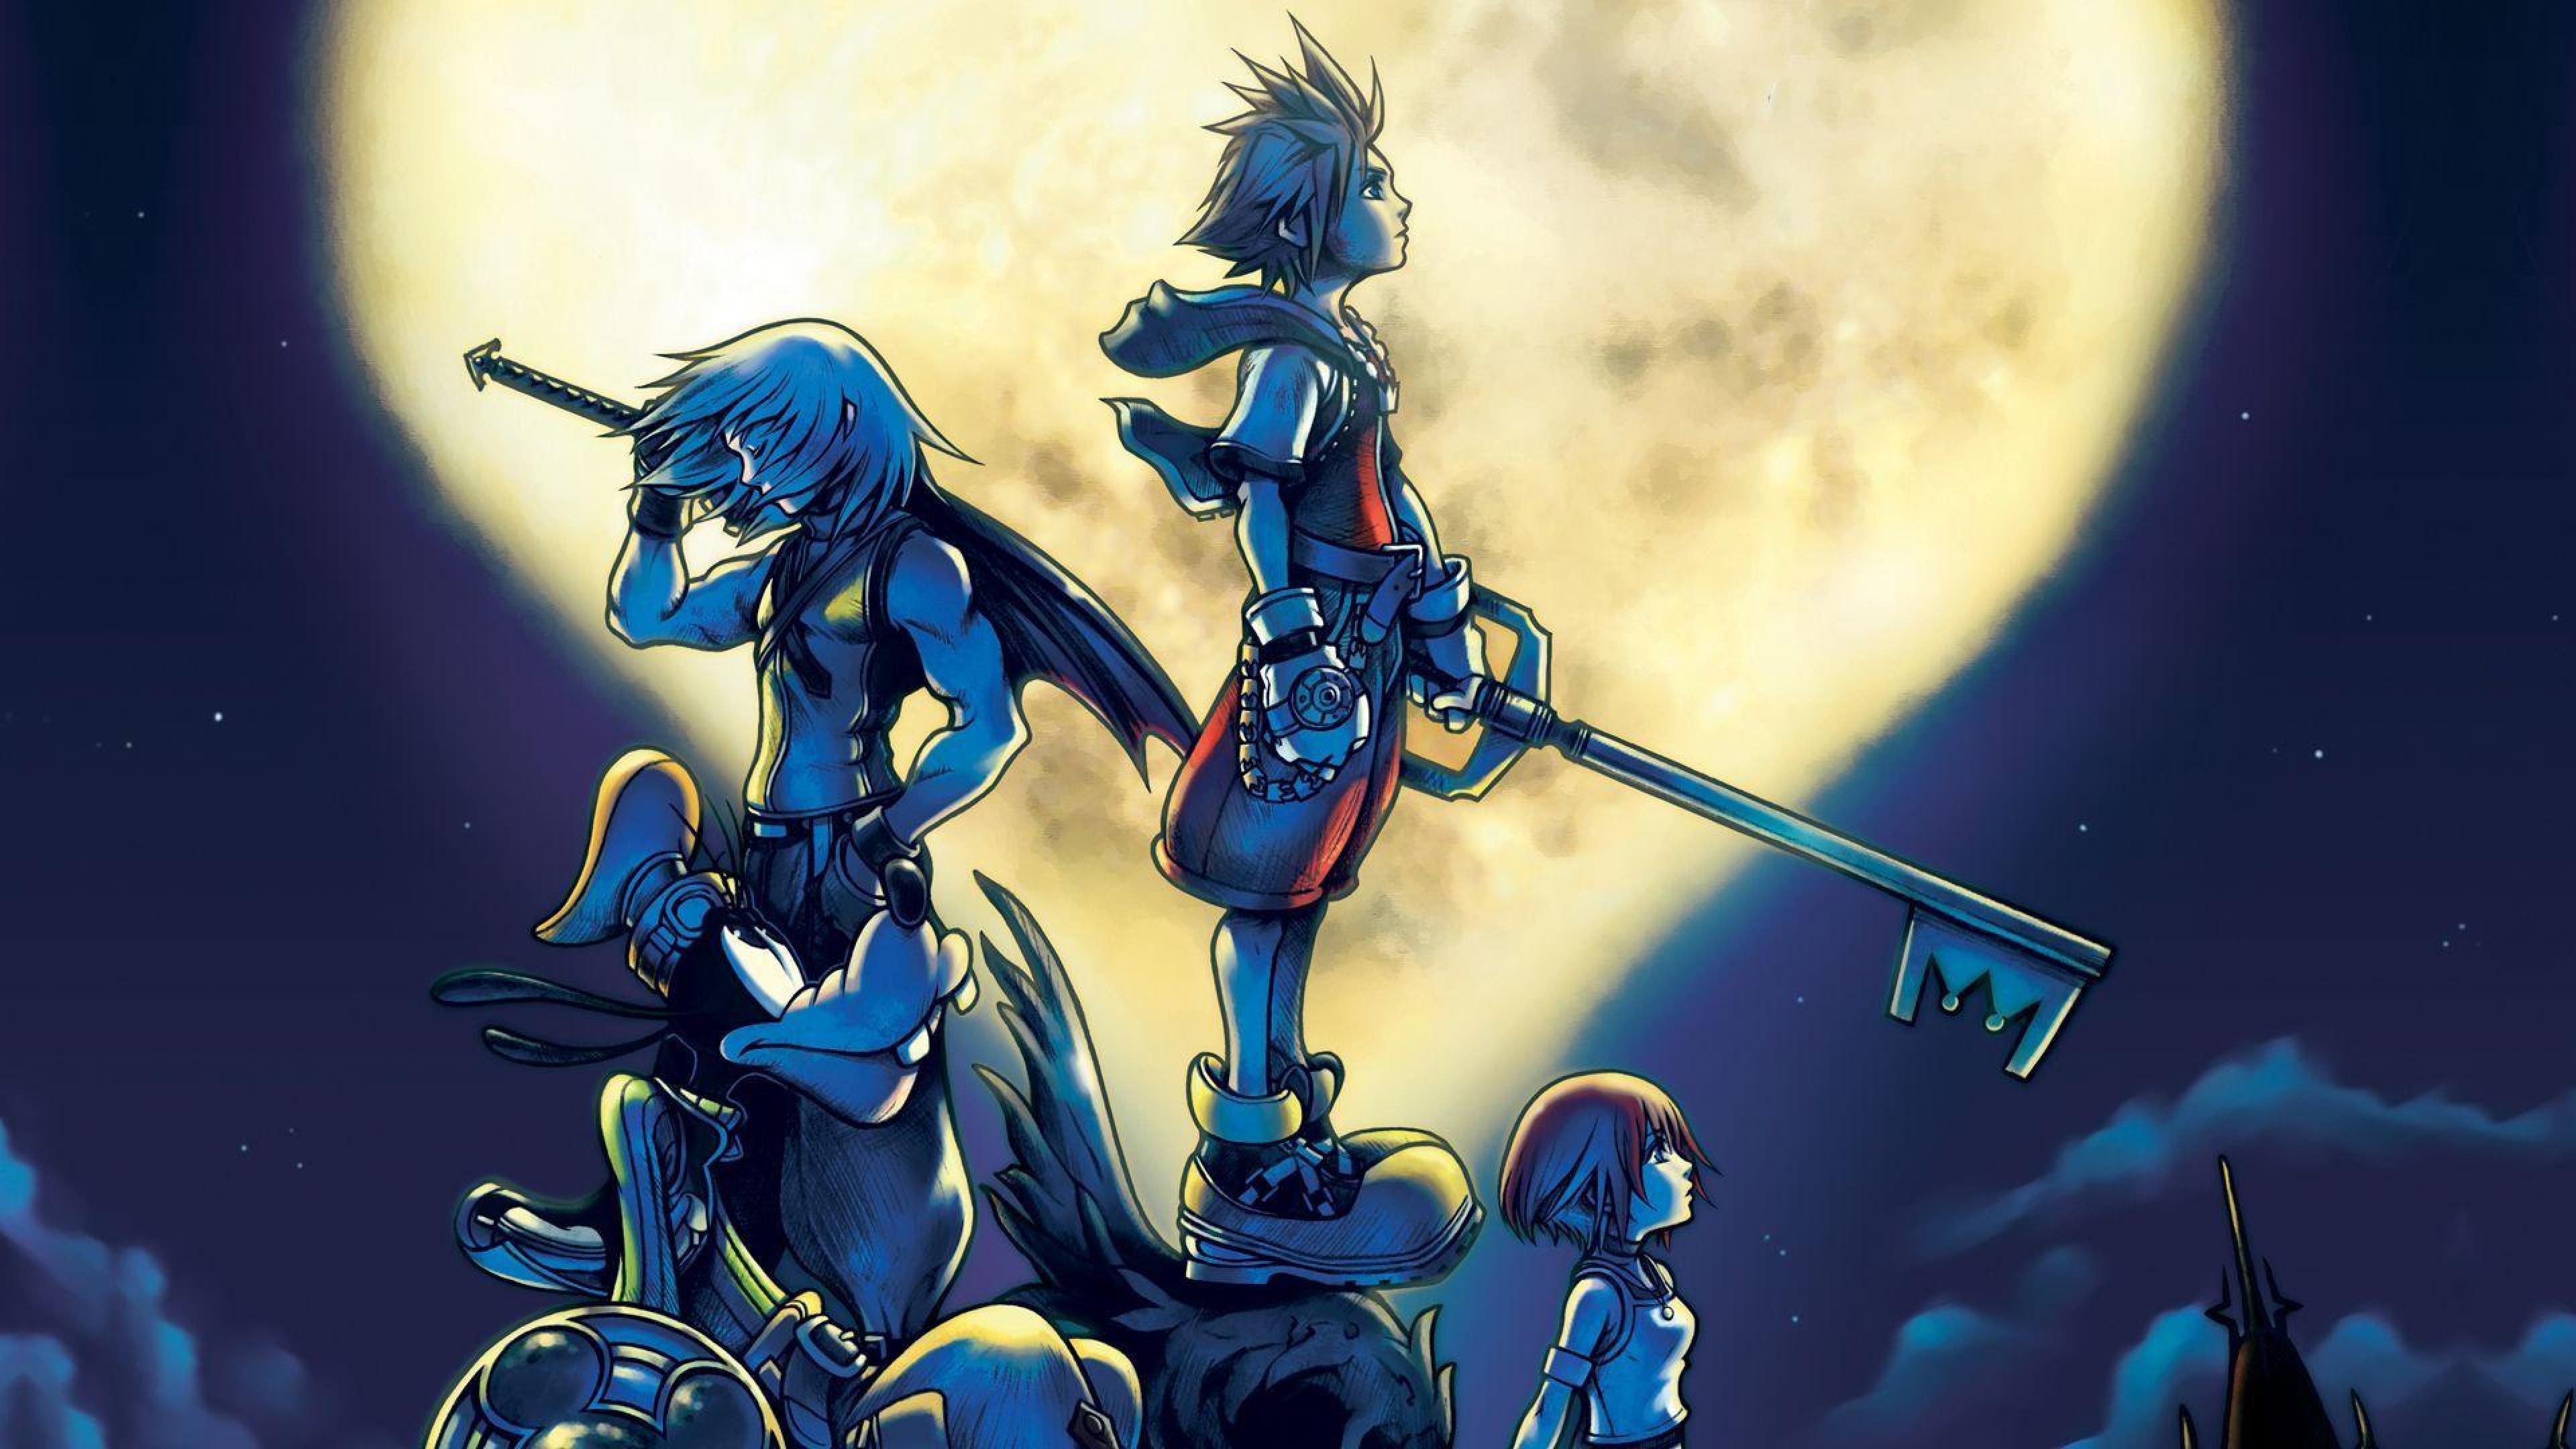 [77+] Kingdom Hearts Desktop Backgrounds on WallpaperSafari